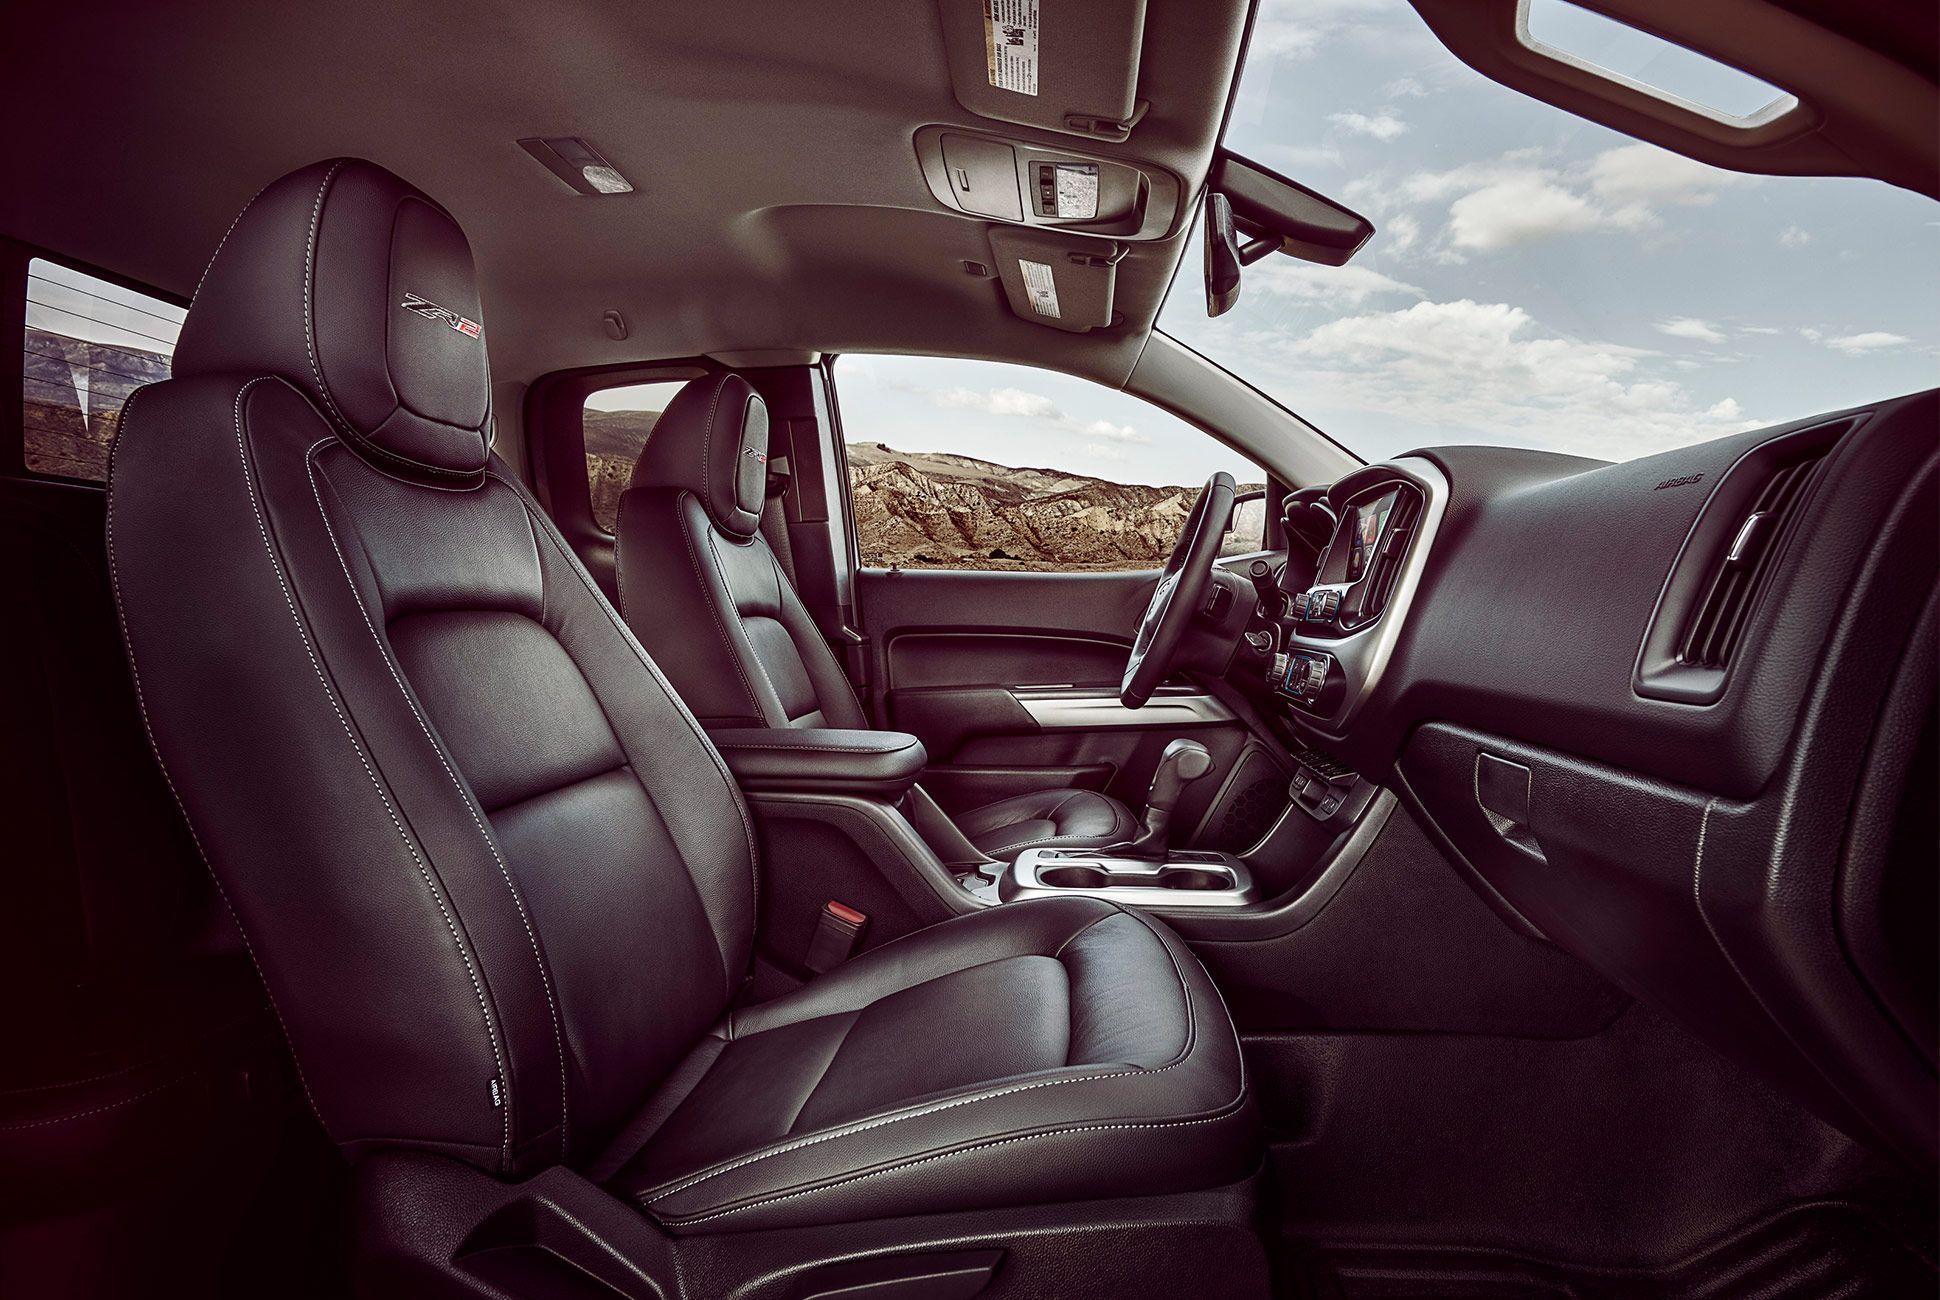 Chevy-Colorado-ZR2-Review-Gear-Patrol-Slide-6